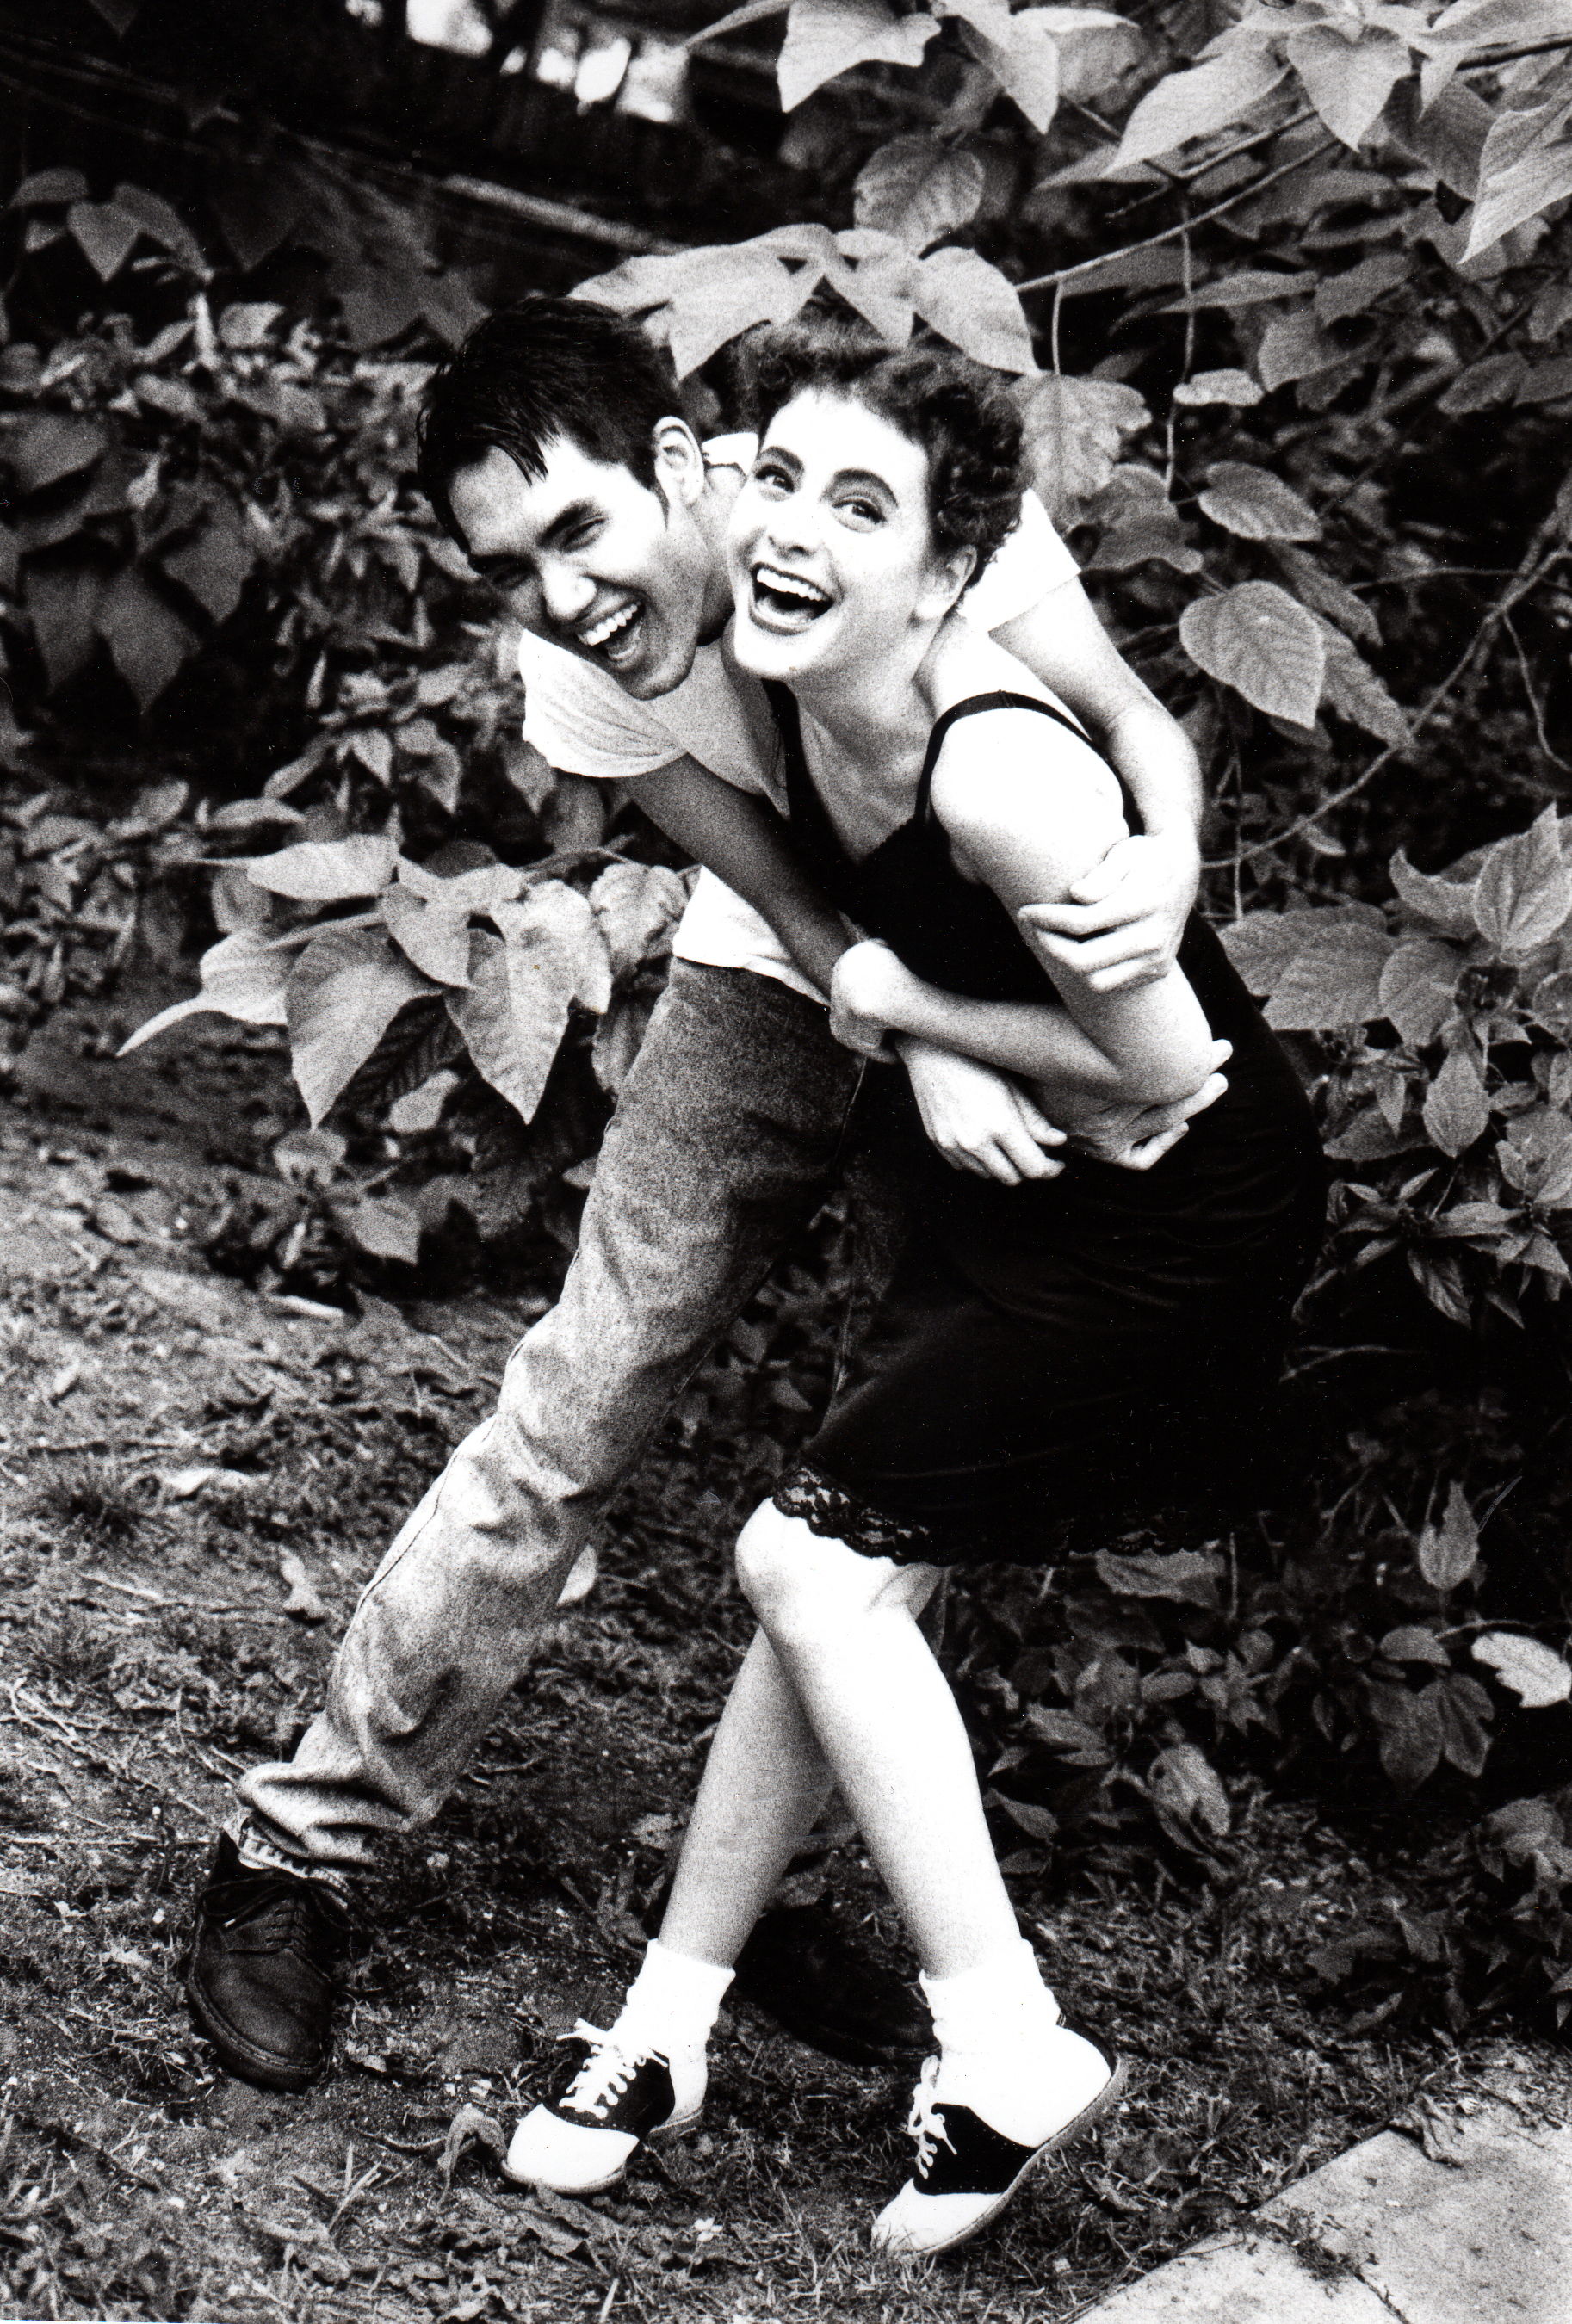 Danny and Maelita